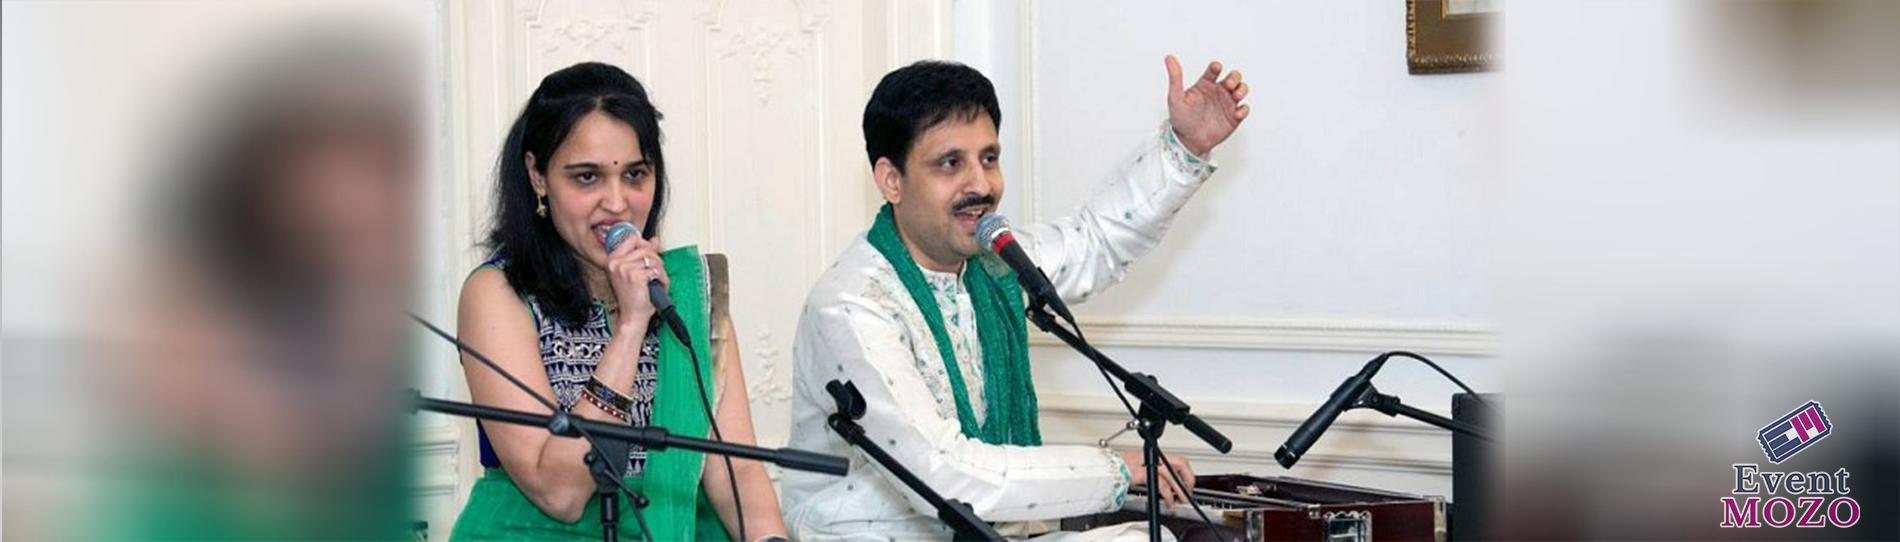 EventMozo Swaraanjali Group - Krushanu & Deeti - Live Navarati Garba Raas